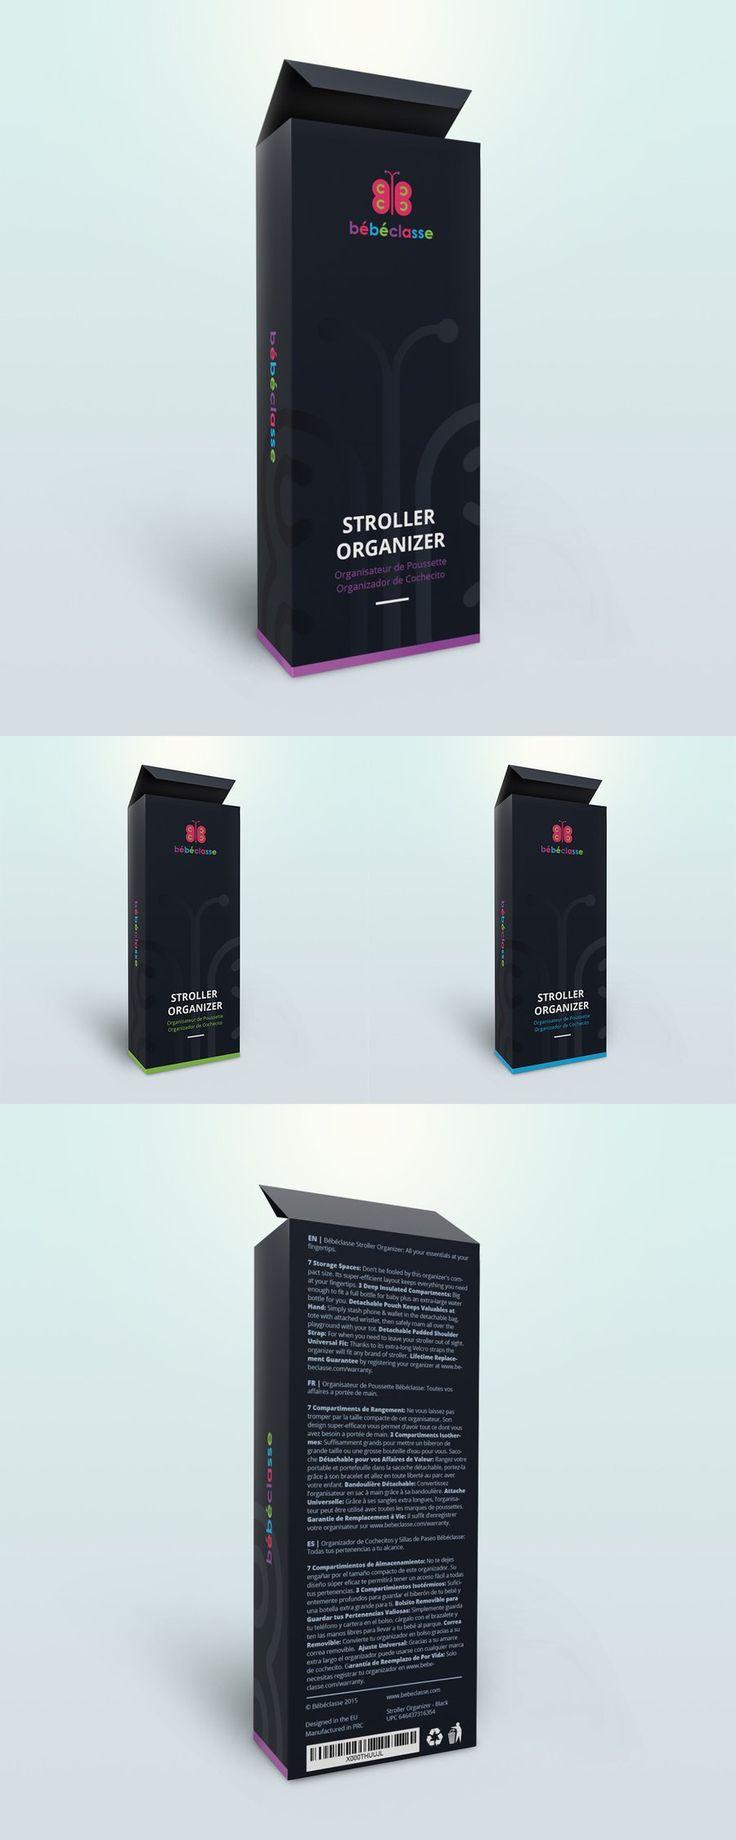 Stroller Organizer | Package Design by attilakamasz